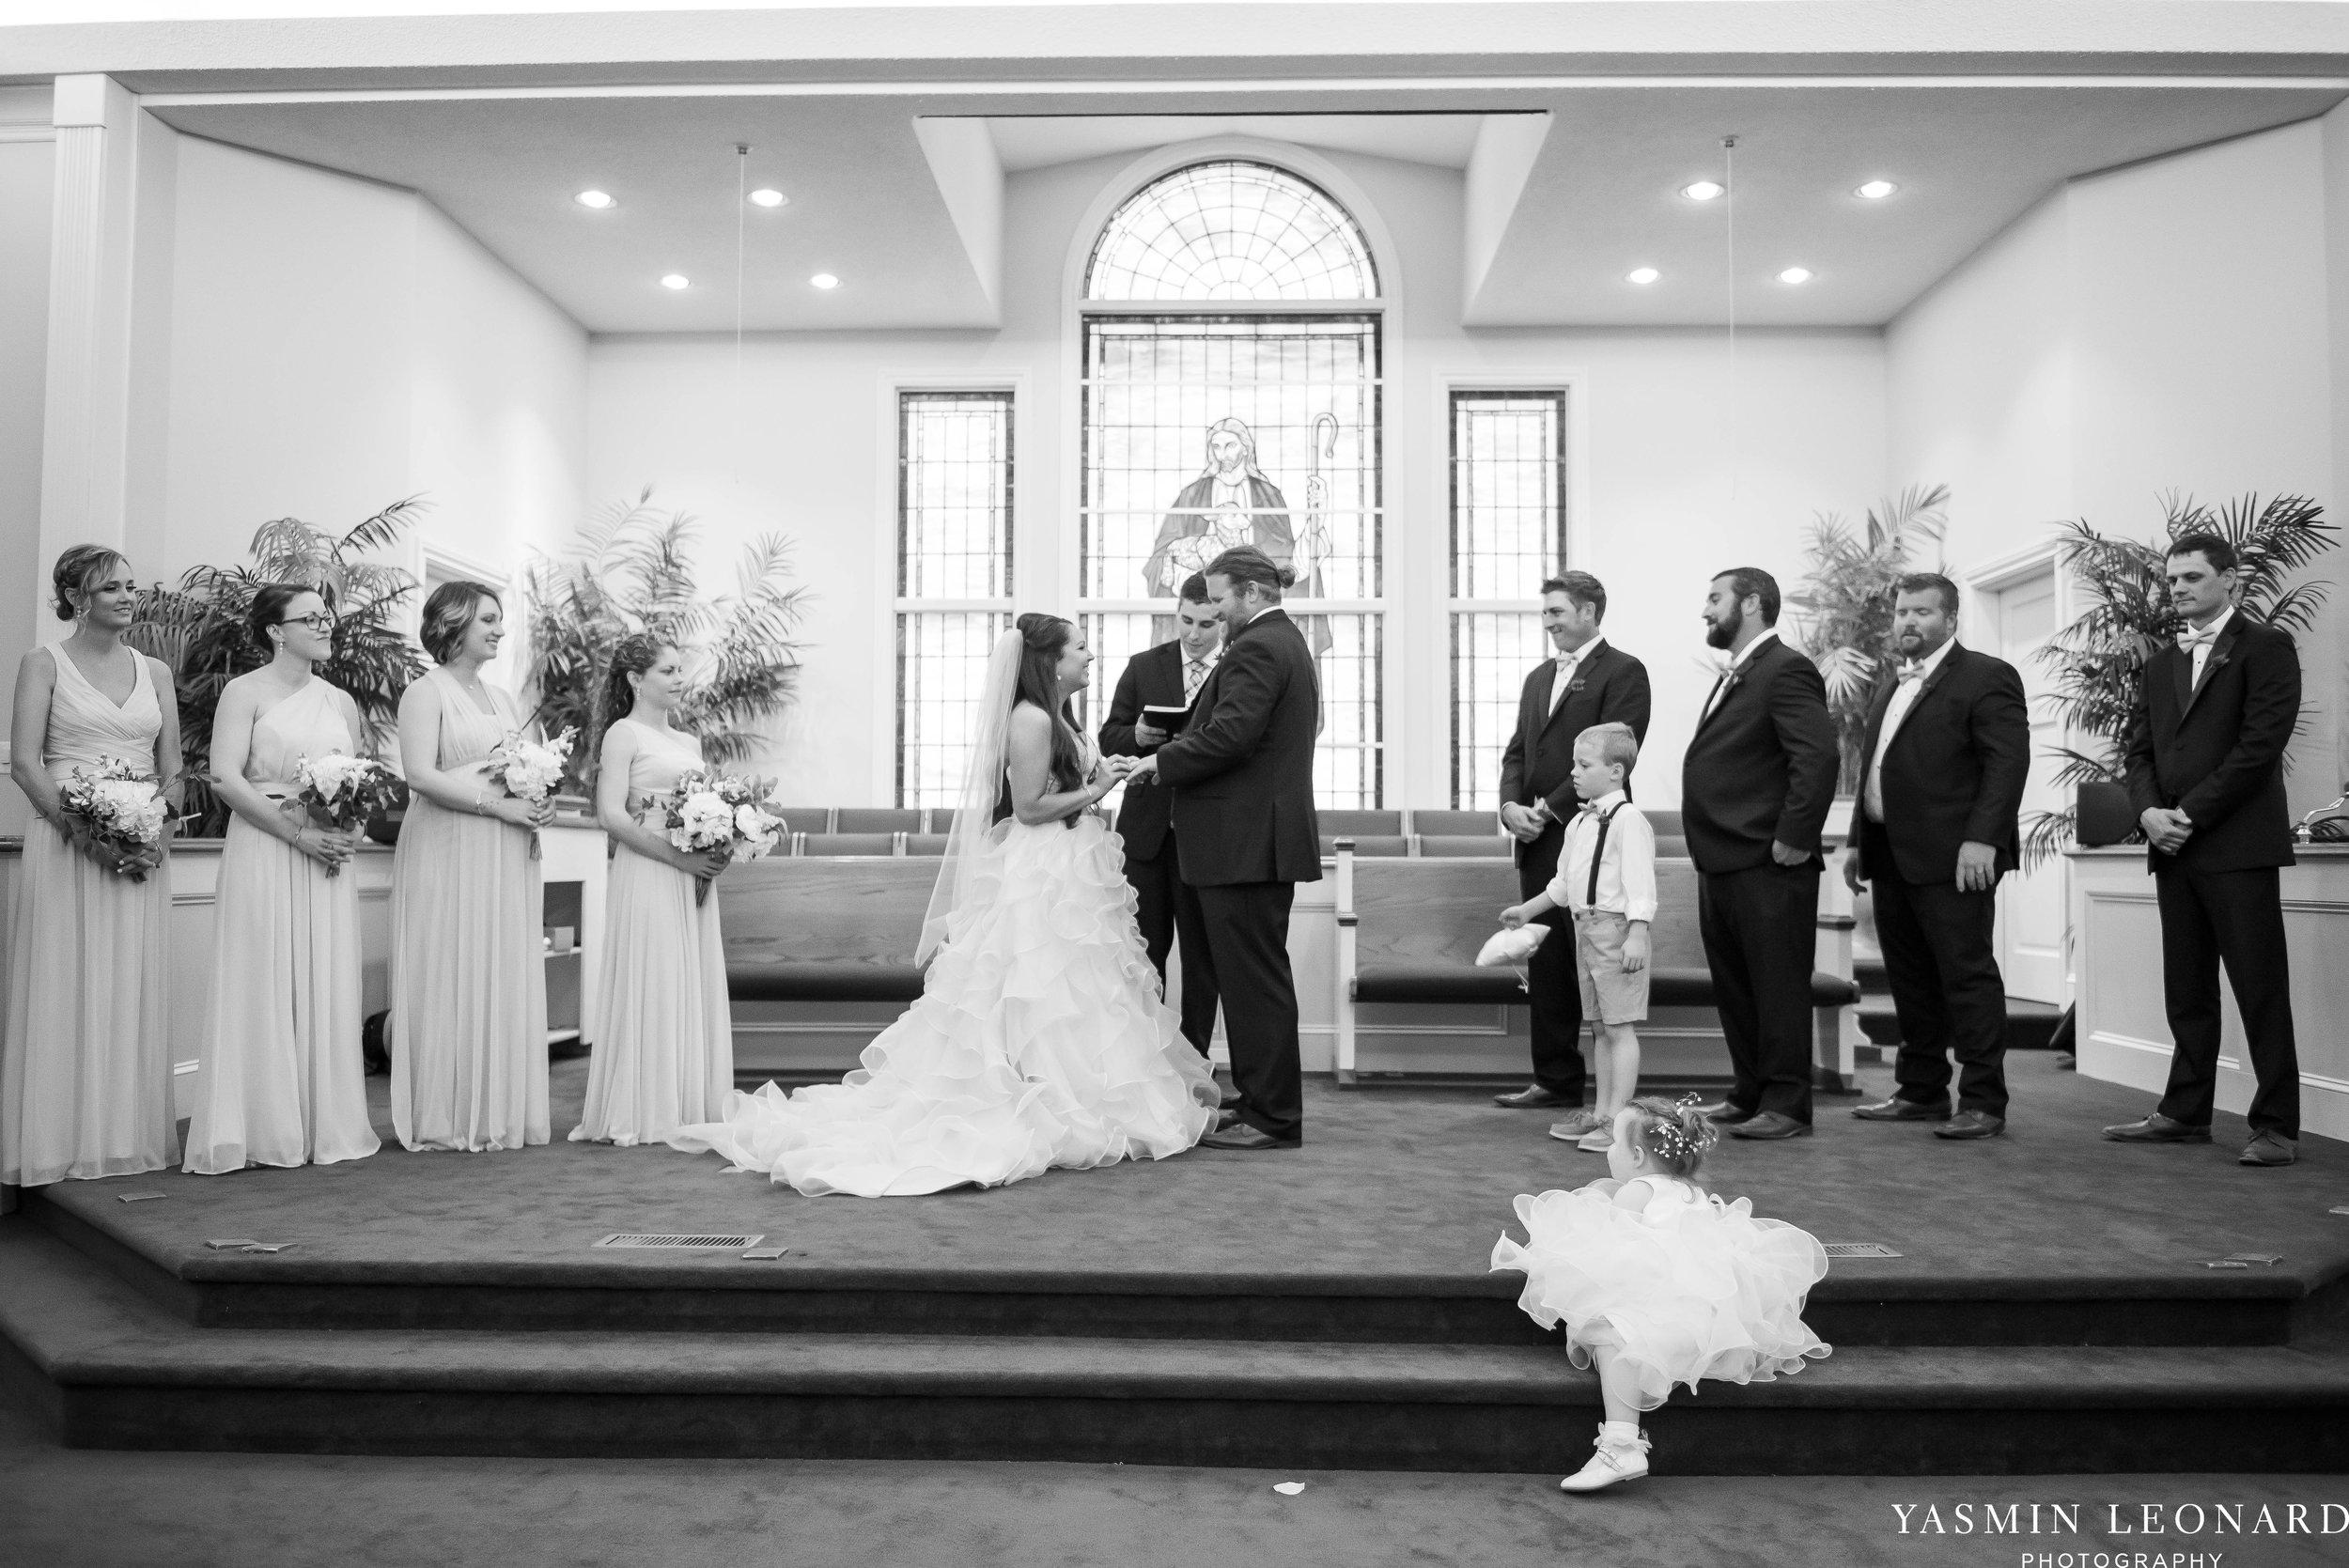 Rain on your wedding day - Rainy Wedding - Plan B for Rain - What to do if it rains on your wedding day - Wedding Inspiration - Outdoor wedding ideas - Rainy Wedding Pictures - Yasmin Leonard Photography-23.jpg